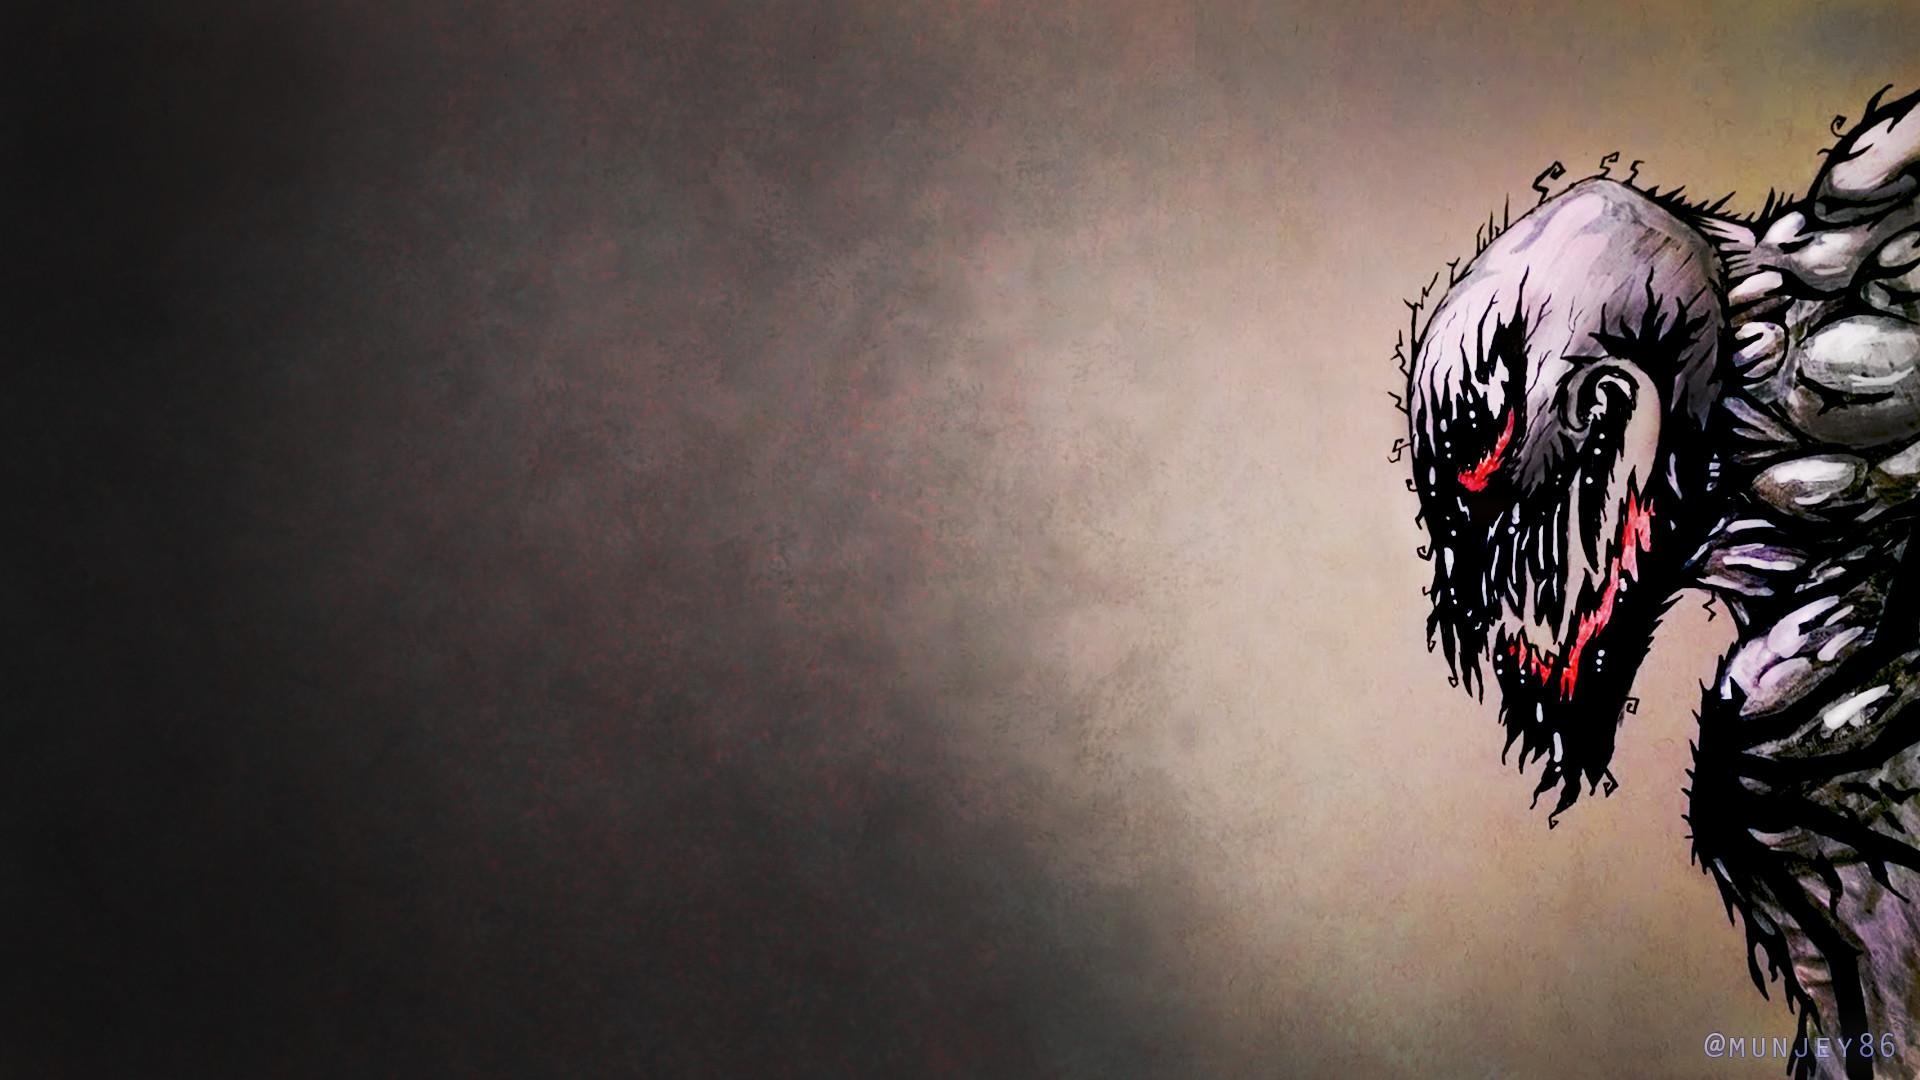 Anti-venom Hd Wallpaper By Tommospidey-d626csp by drbaca420 on .